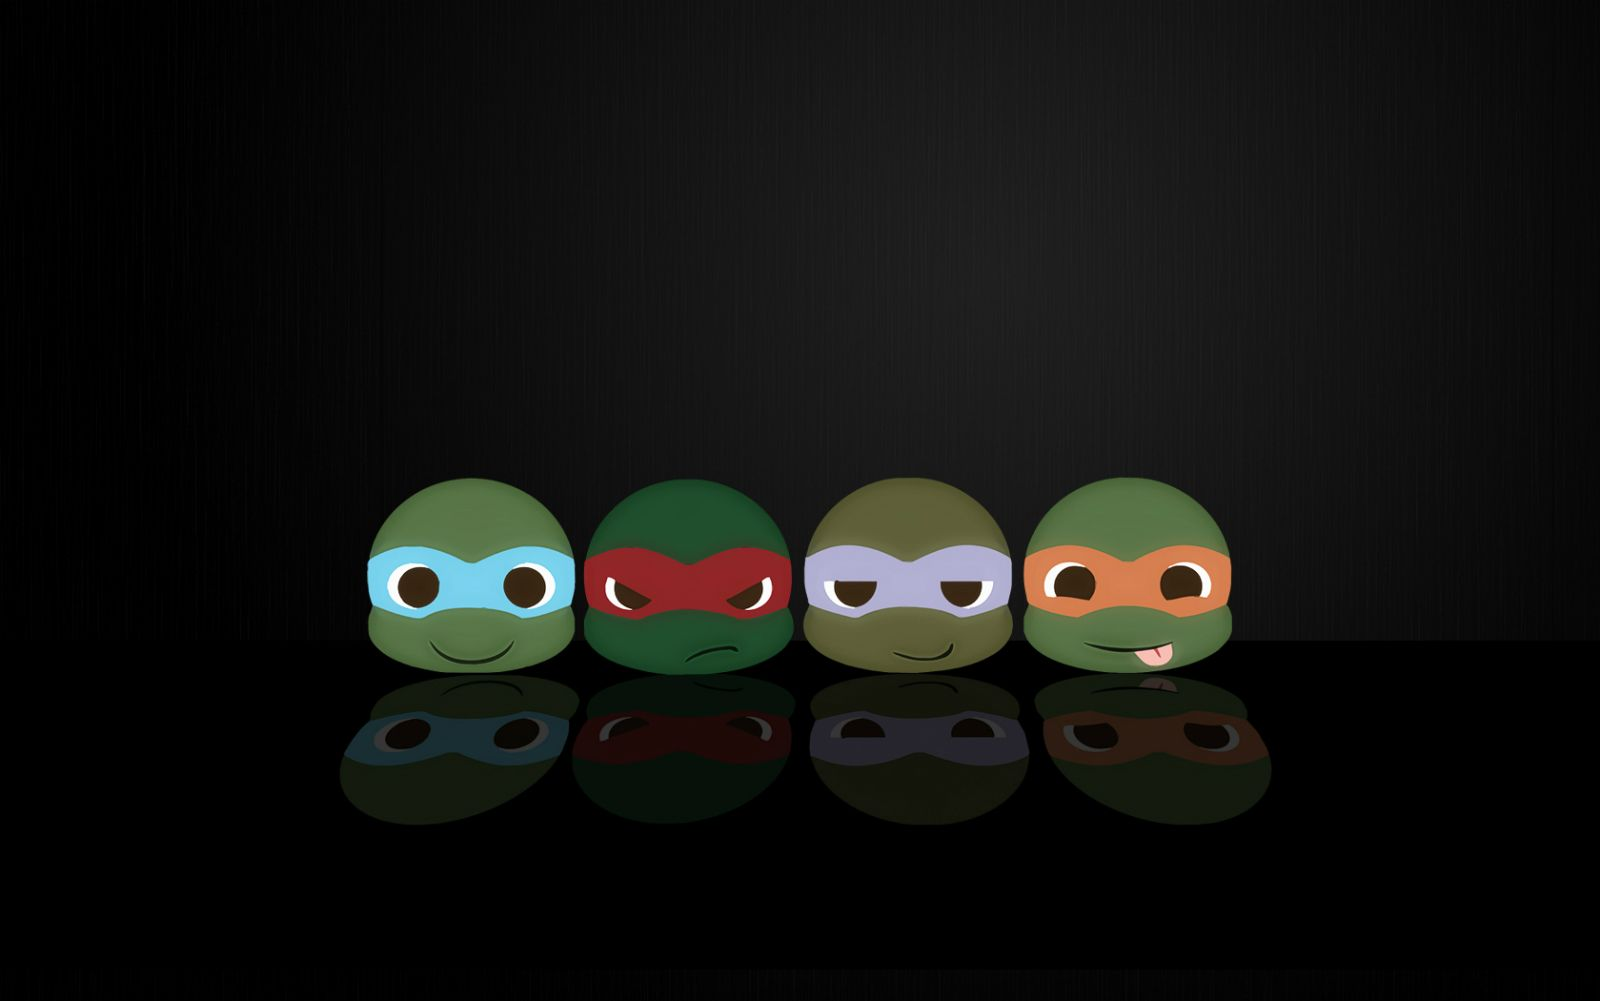 ninja turtles wallpaper tumblr: yandex.görsel'de 26 bin görsel